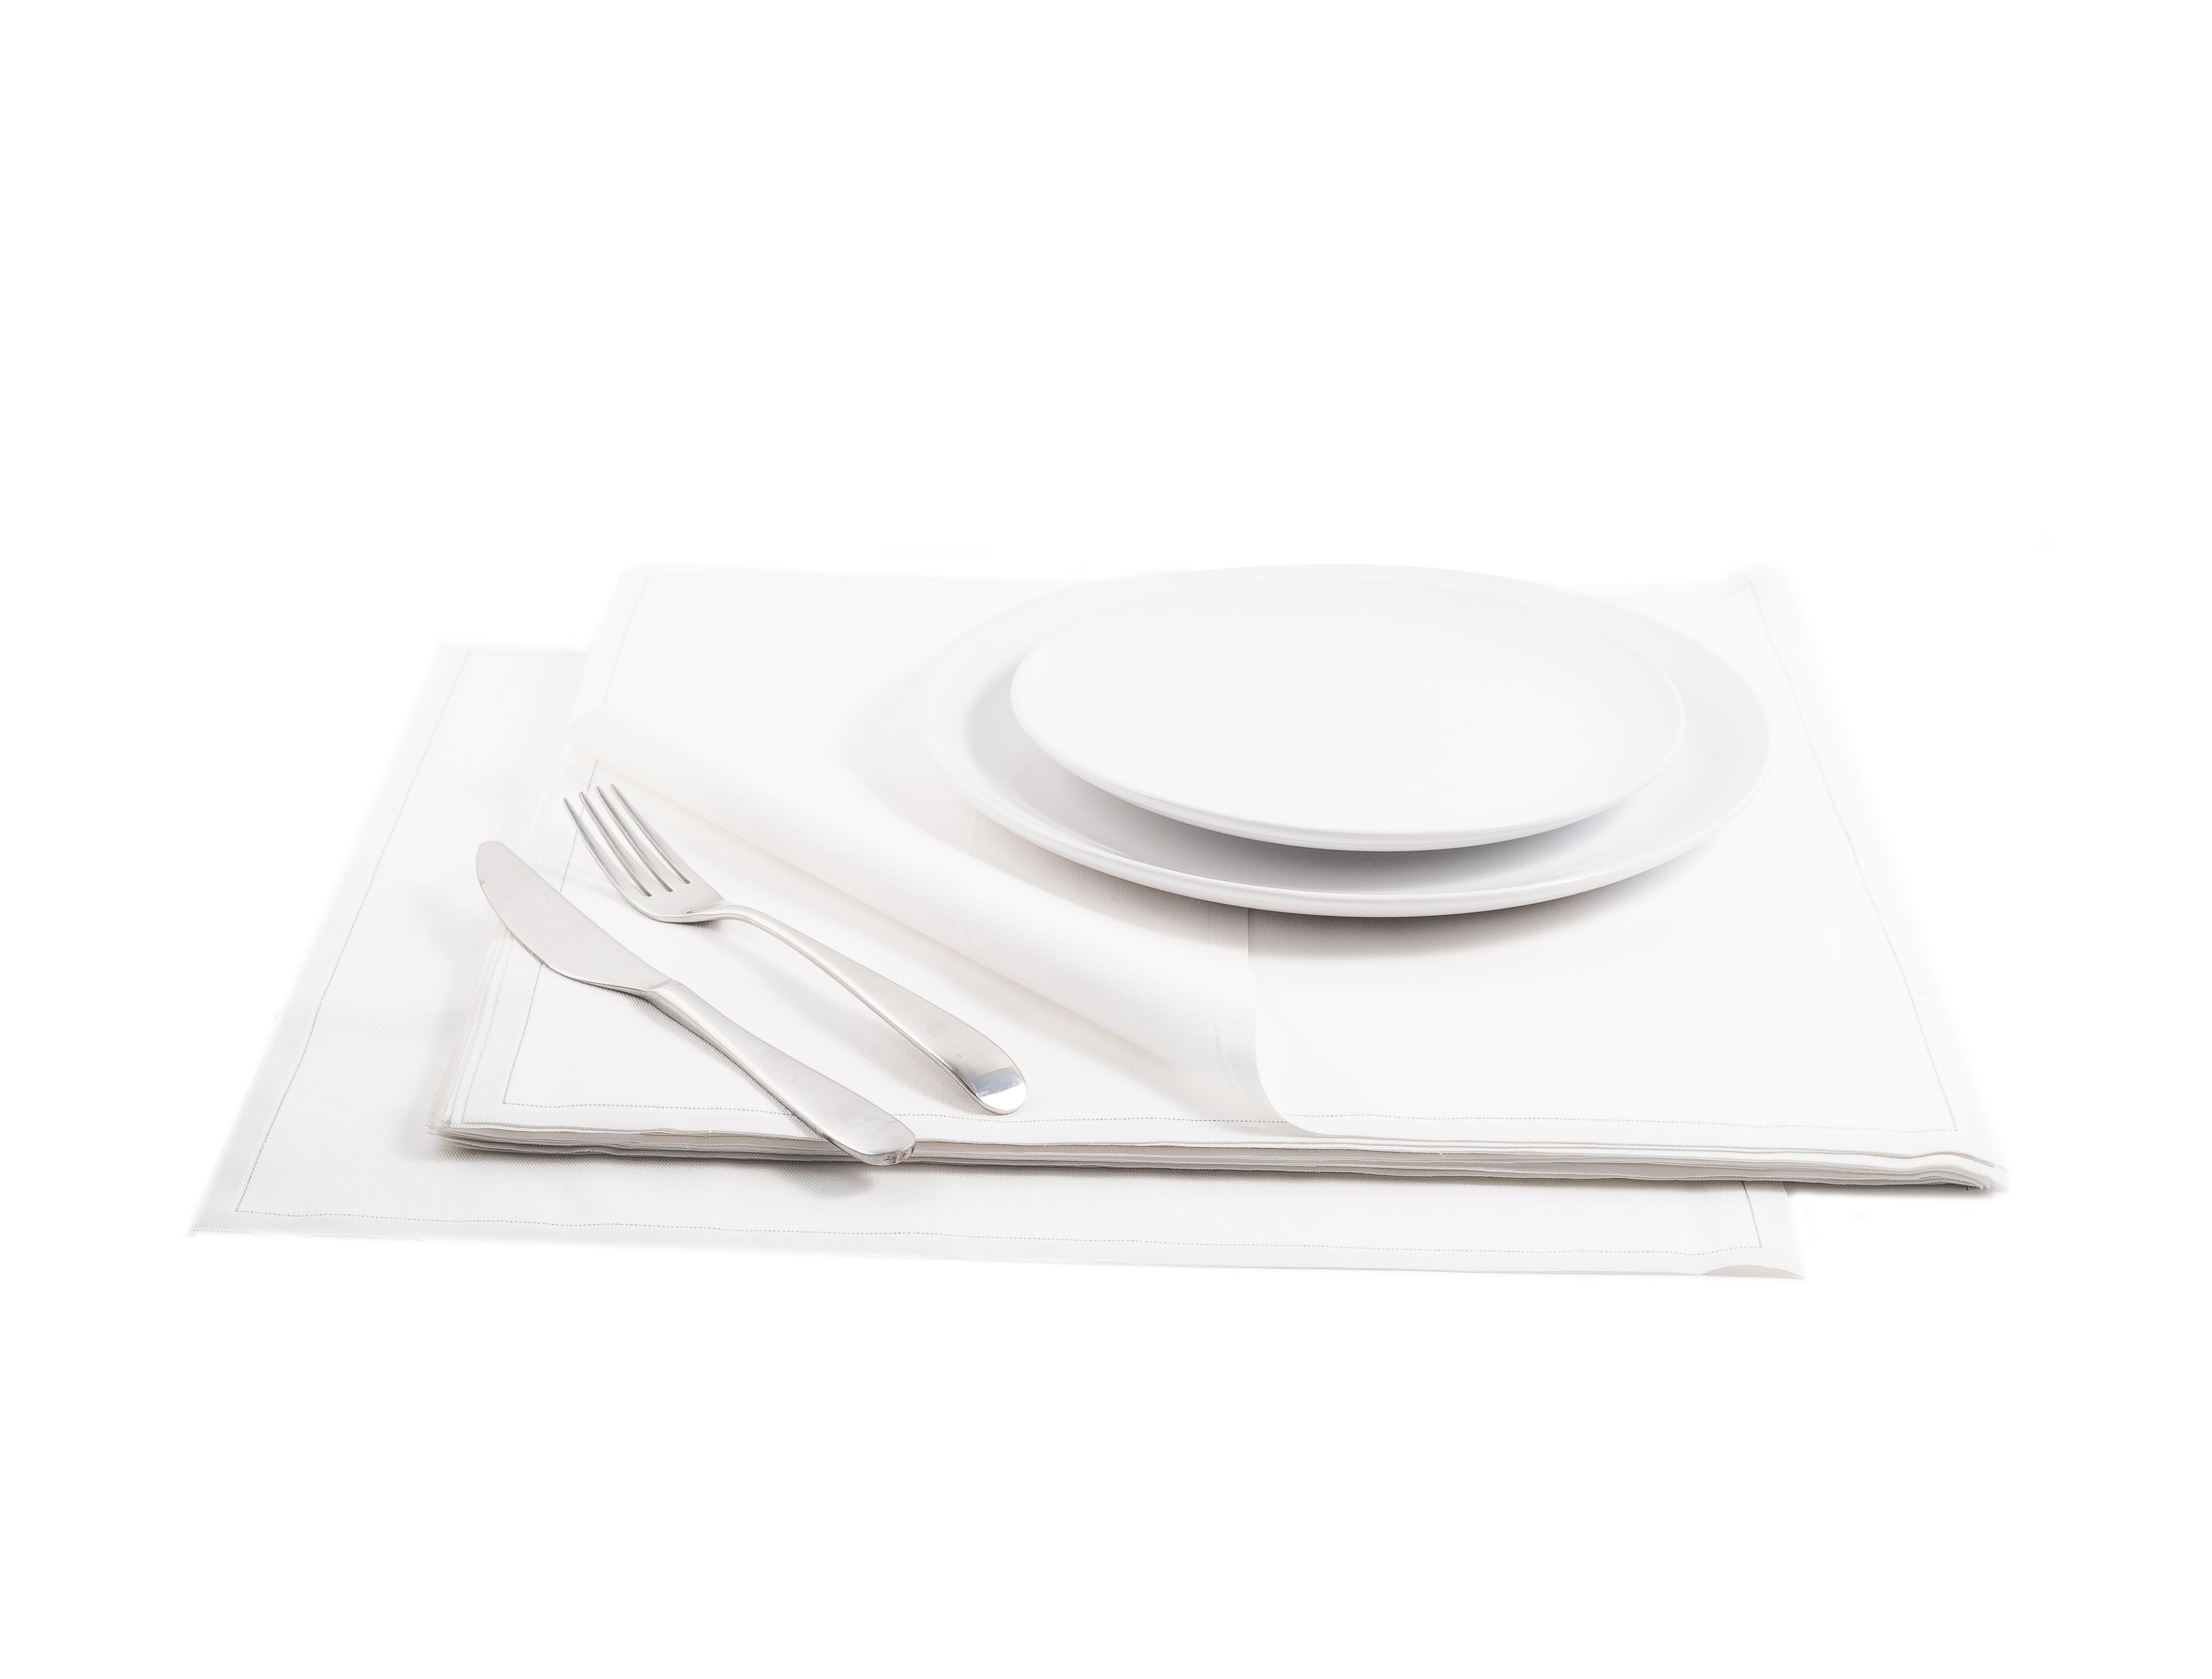 "White Cotton Premium Dinner (200 GSM) - 15.8"" x 15.8"" - 250 Units"